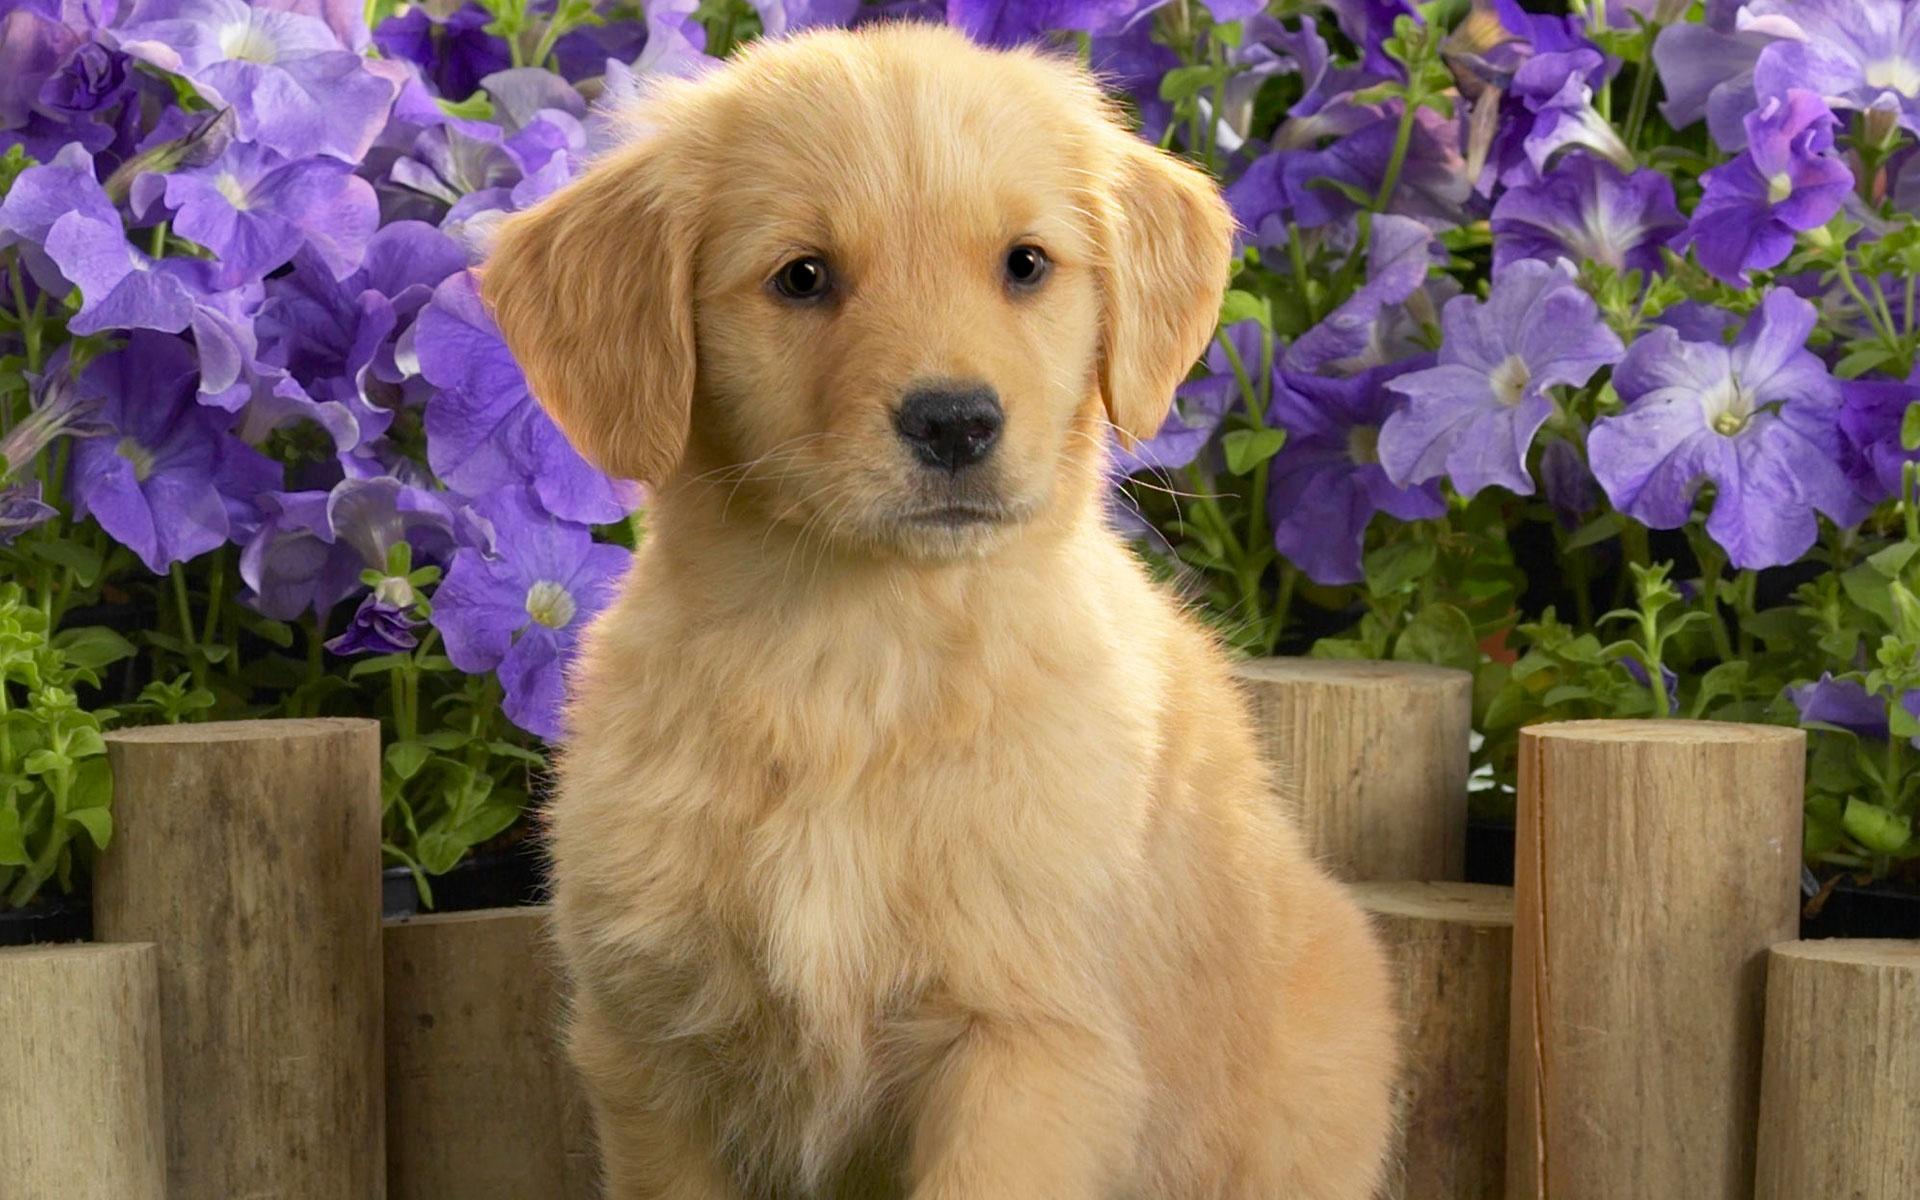 Yellow Labrador Puppy wallpaper 1920x1200